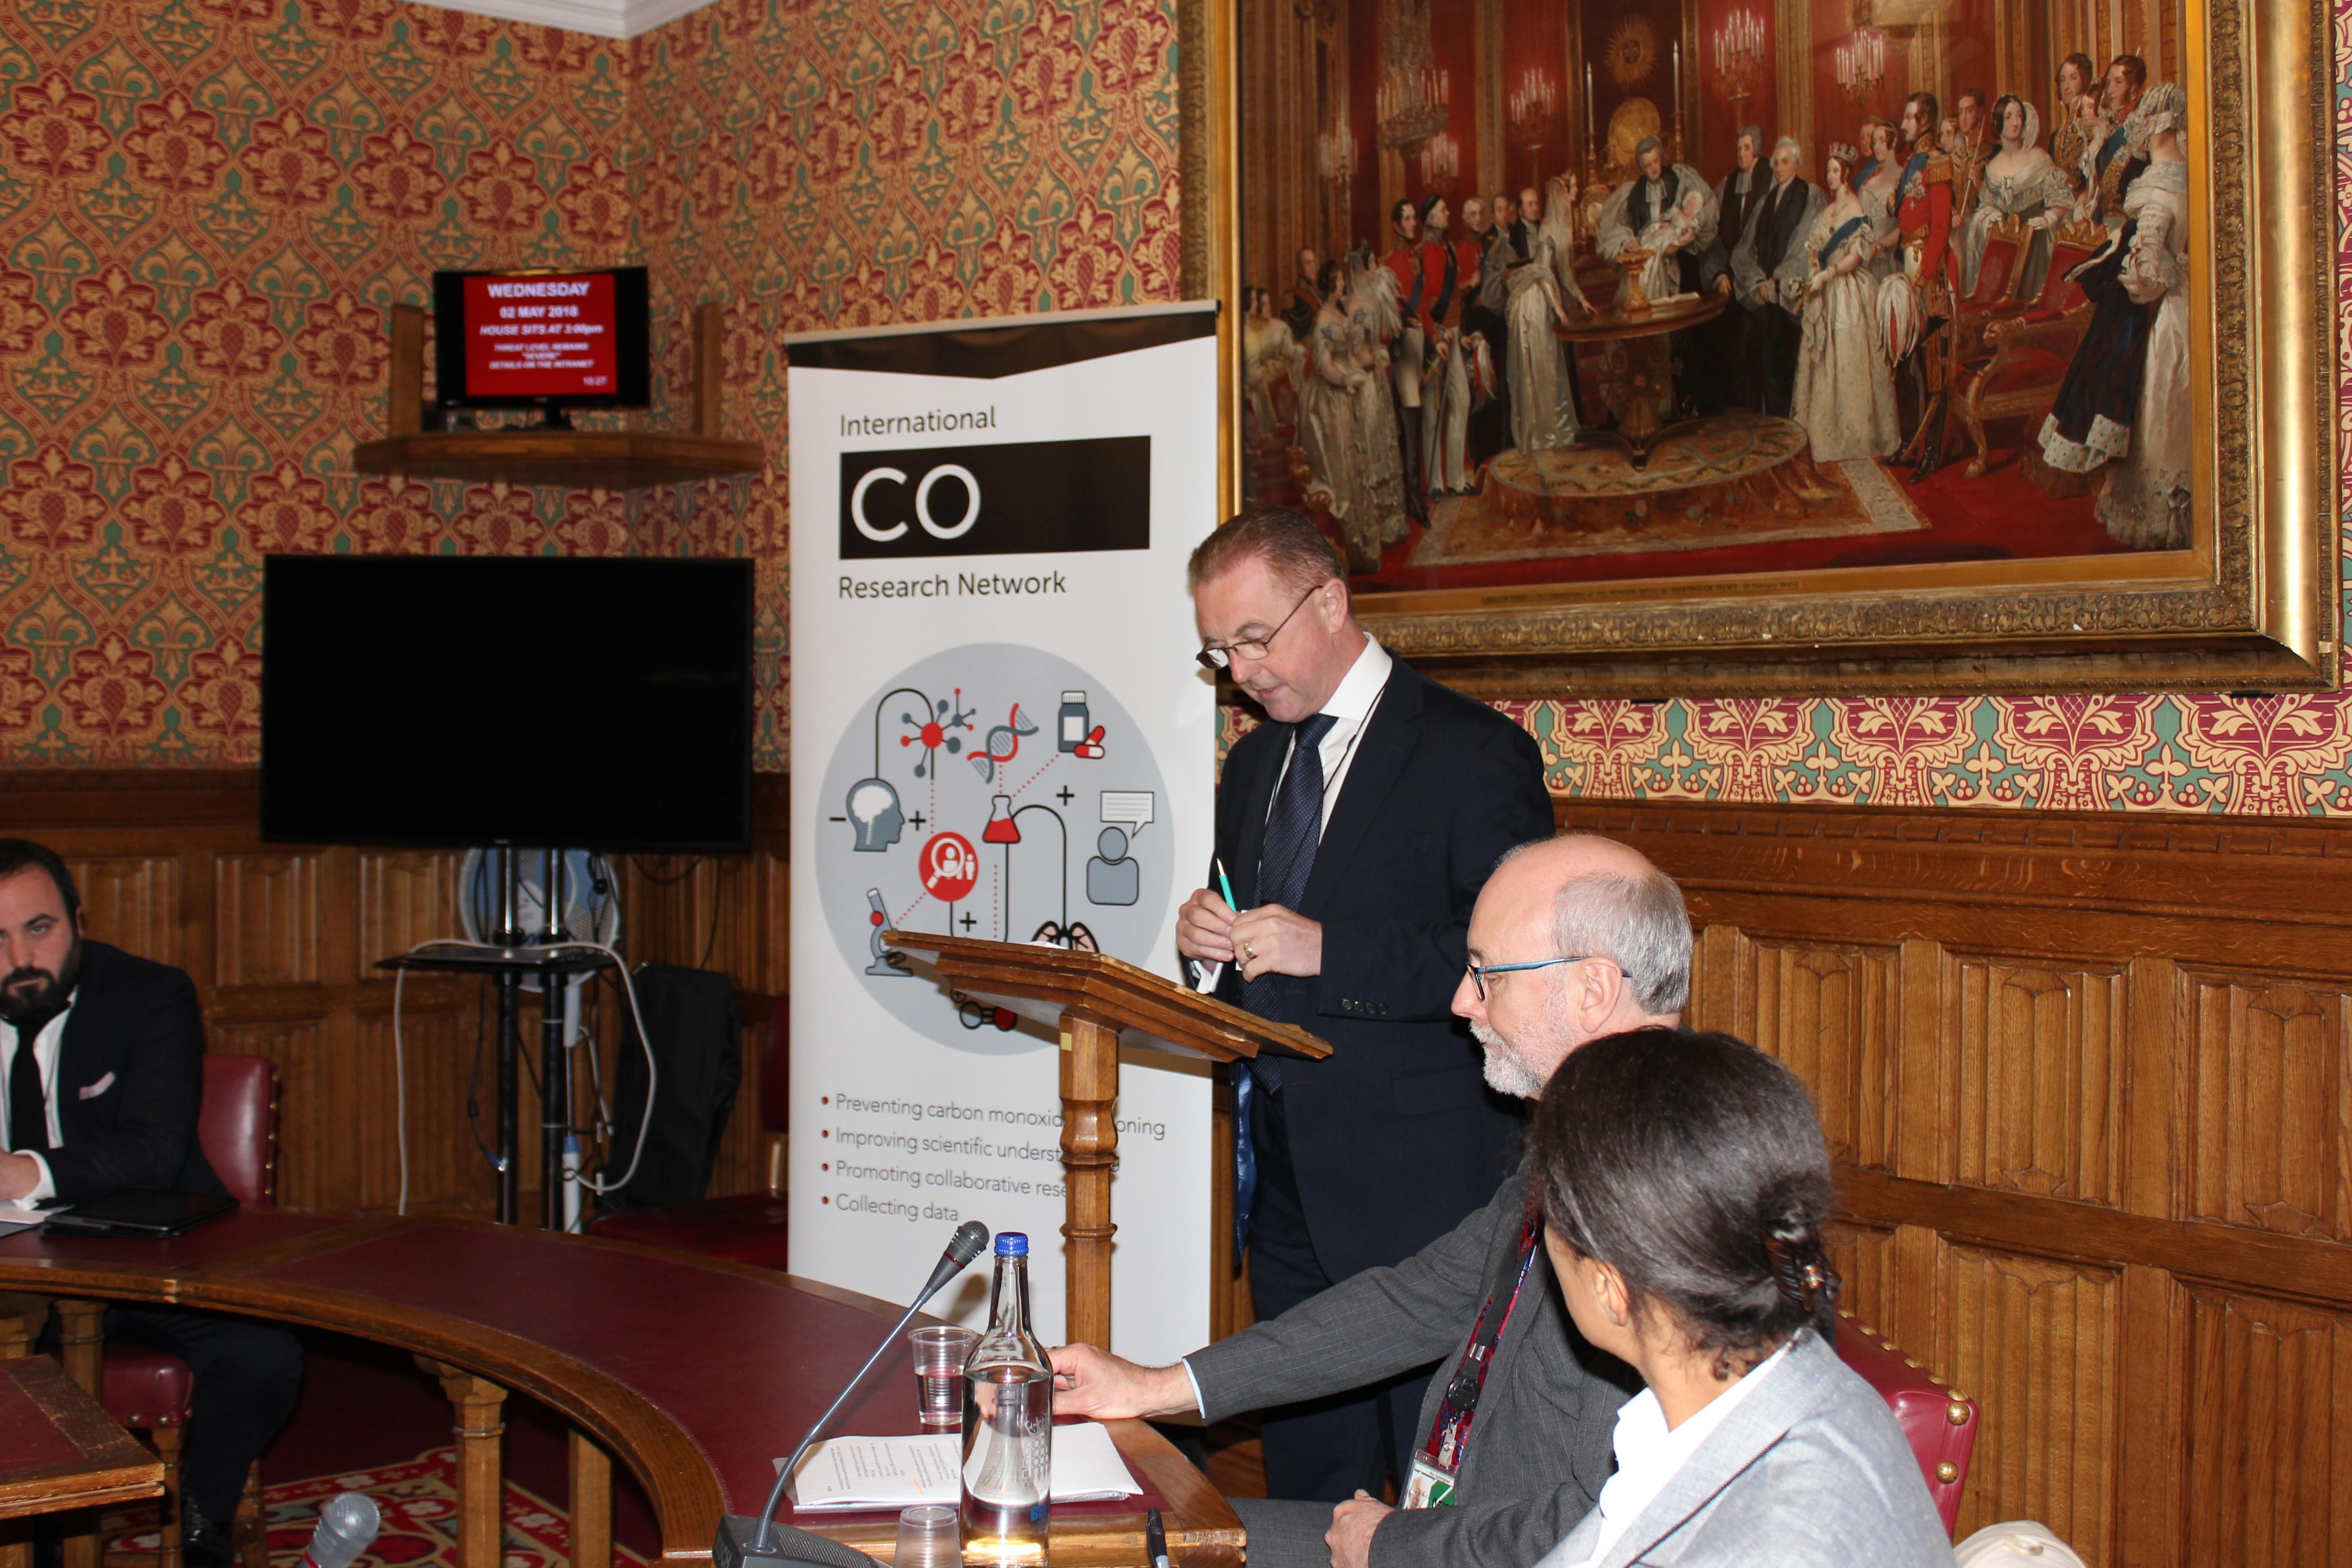 Chris Bielby, ICORN launch